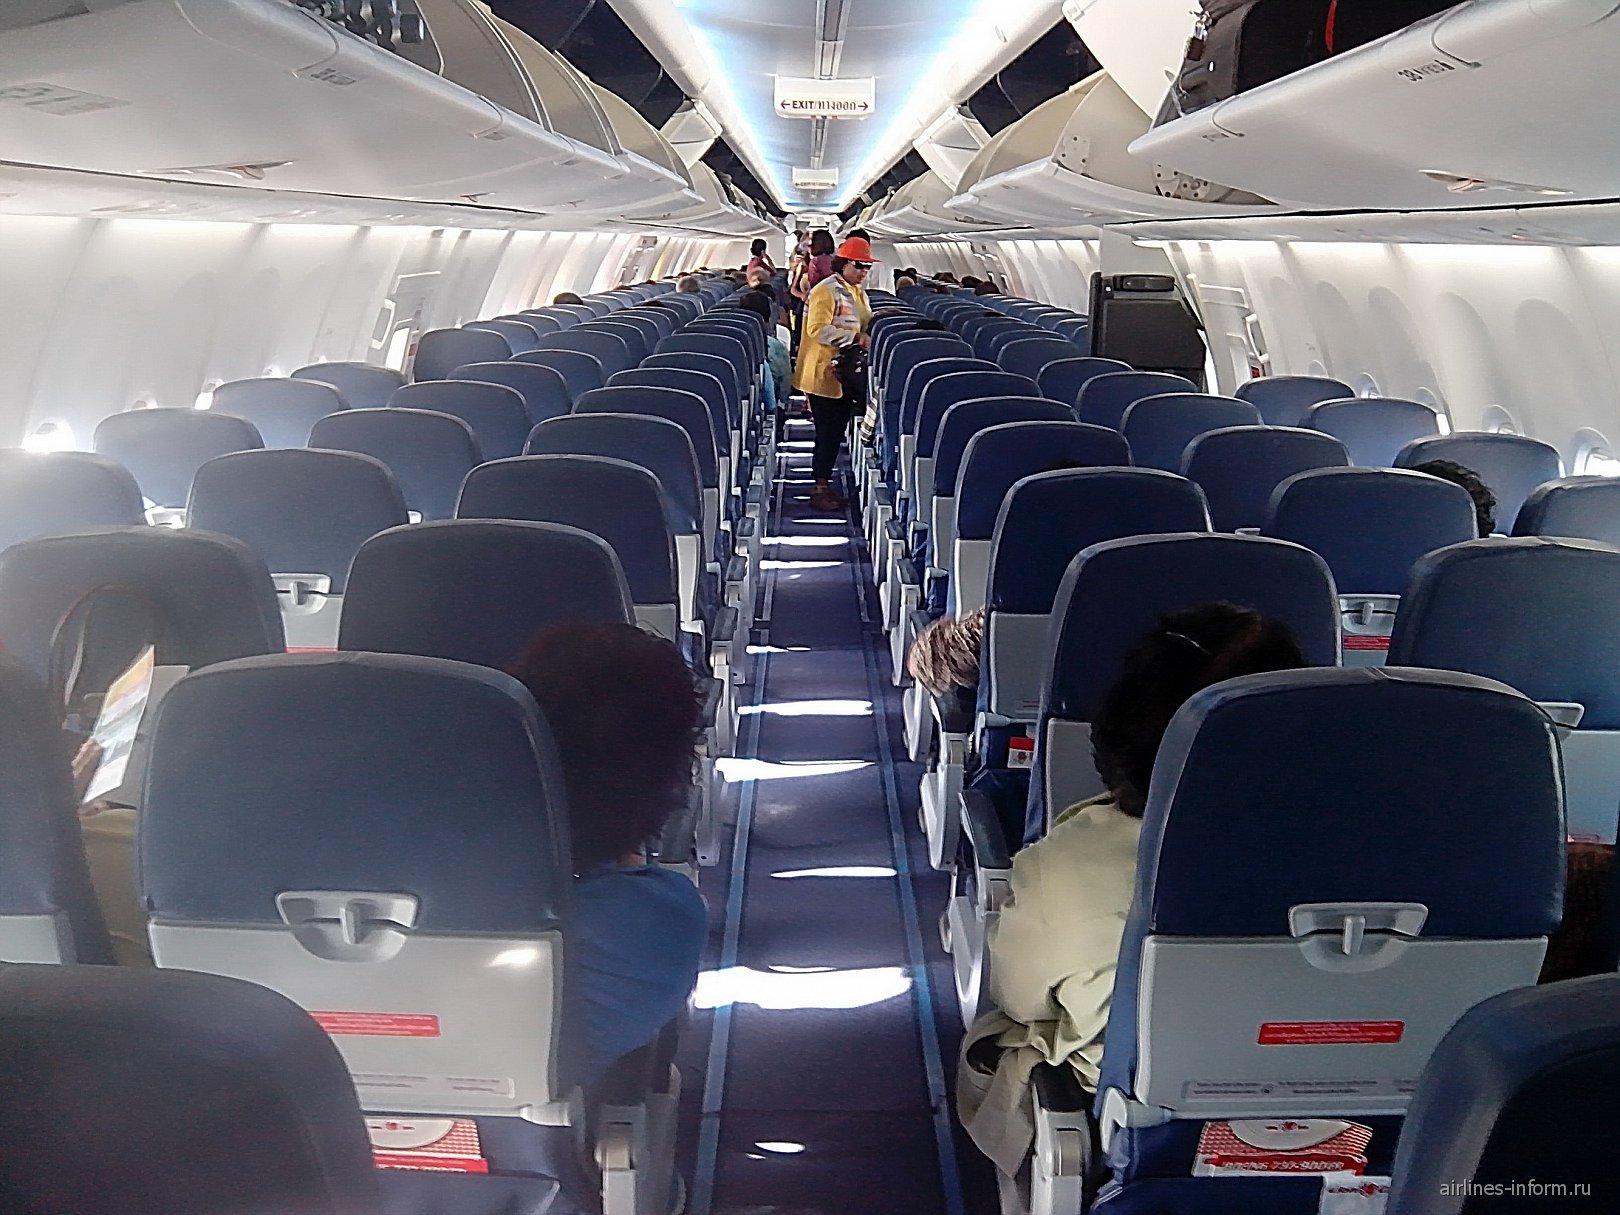 Салон самолета Boeing 737-900ER авиакомпании Thai Lion Air